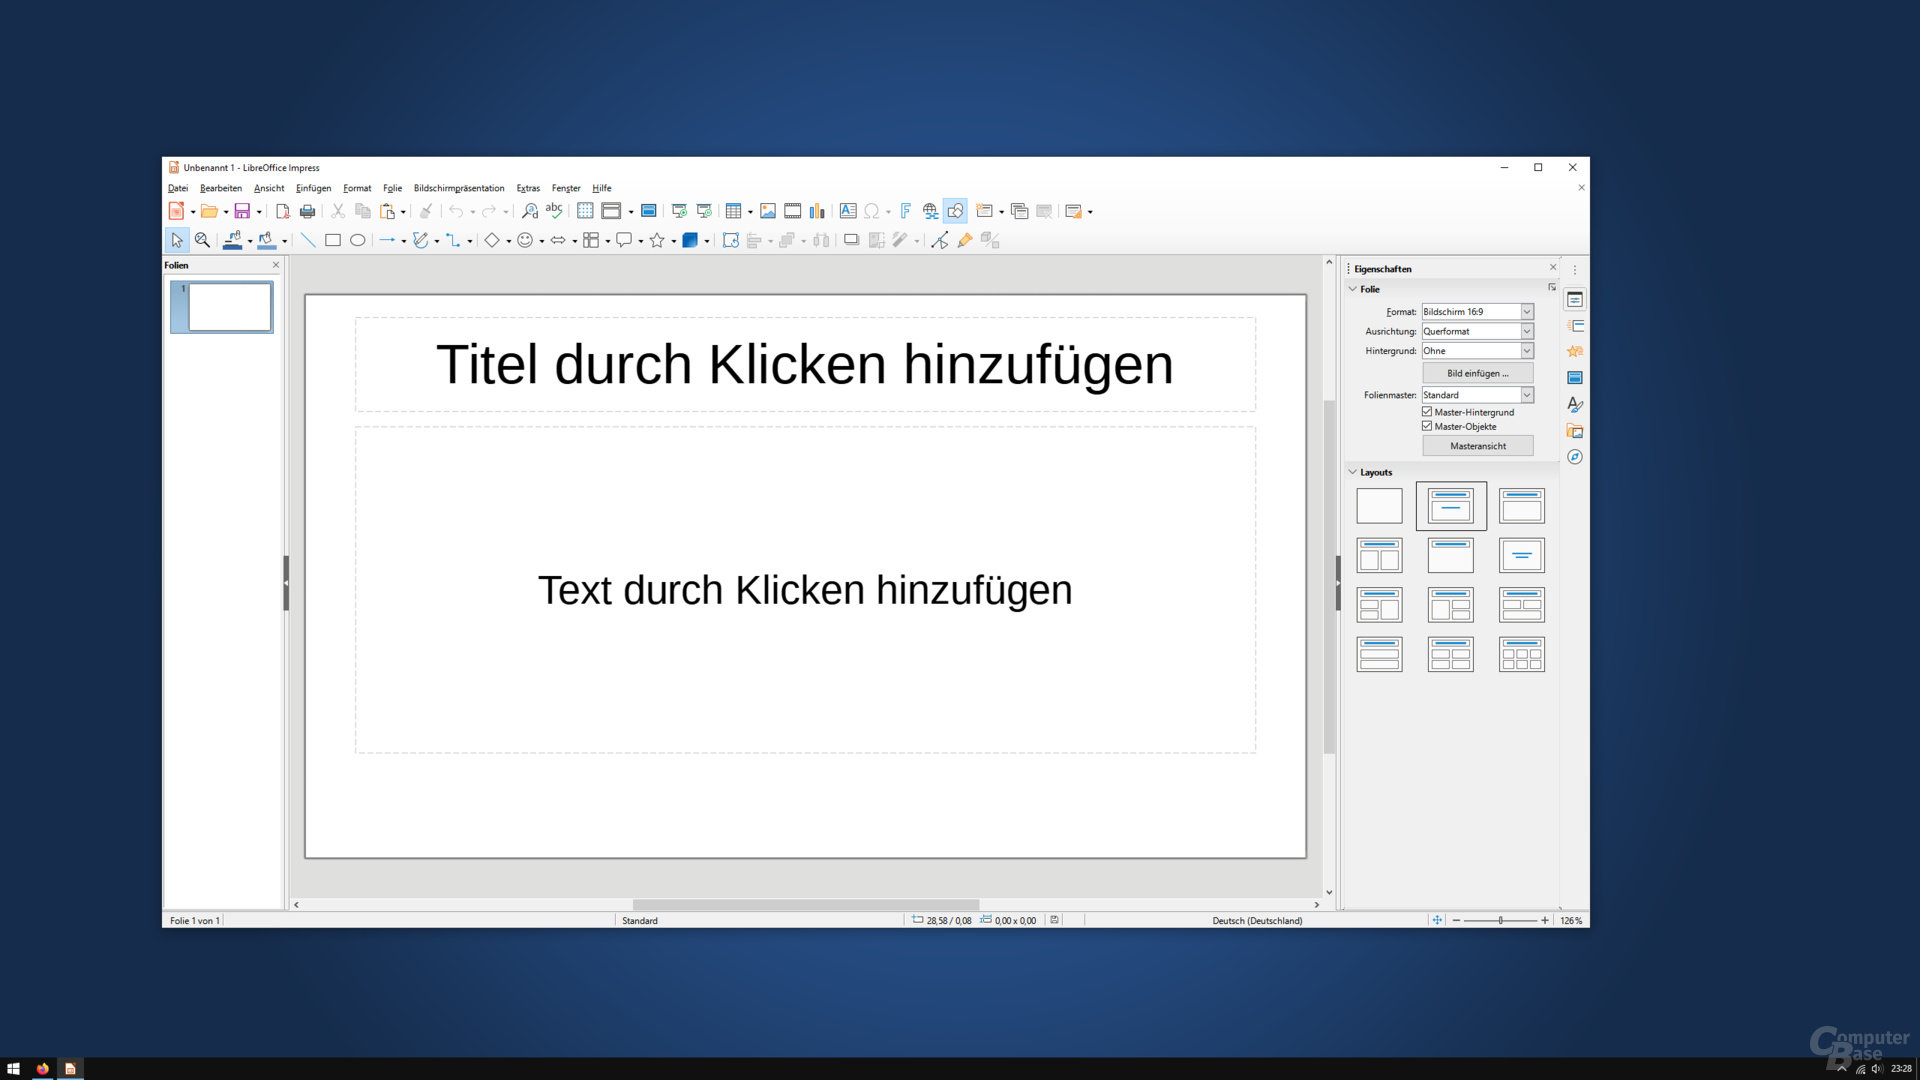 LibreOffice 7.0.0.3 – Impress